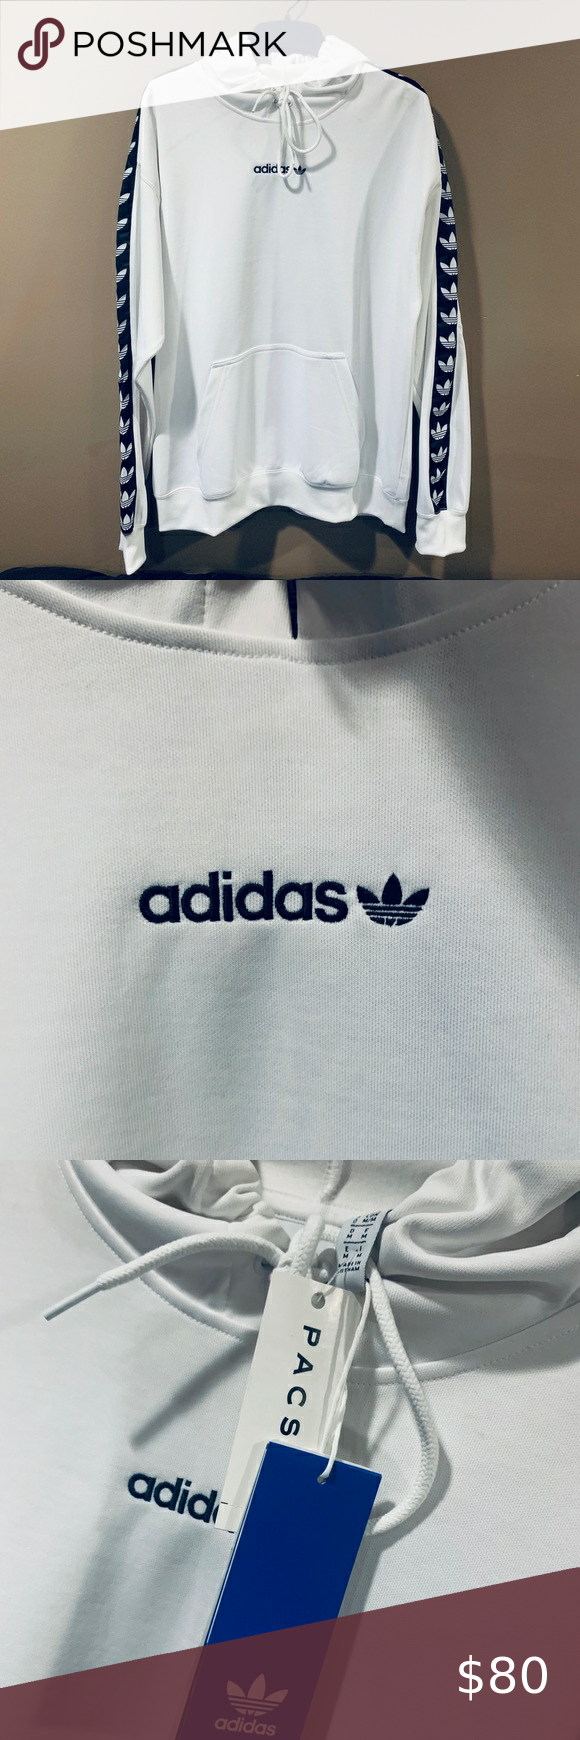 Adidas Originals Tnt Tape Hoodie White Sz M White Hoodie Adidas Originals Sweatshirt Shirt [ 1740 x 580 Pixel ]